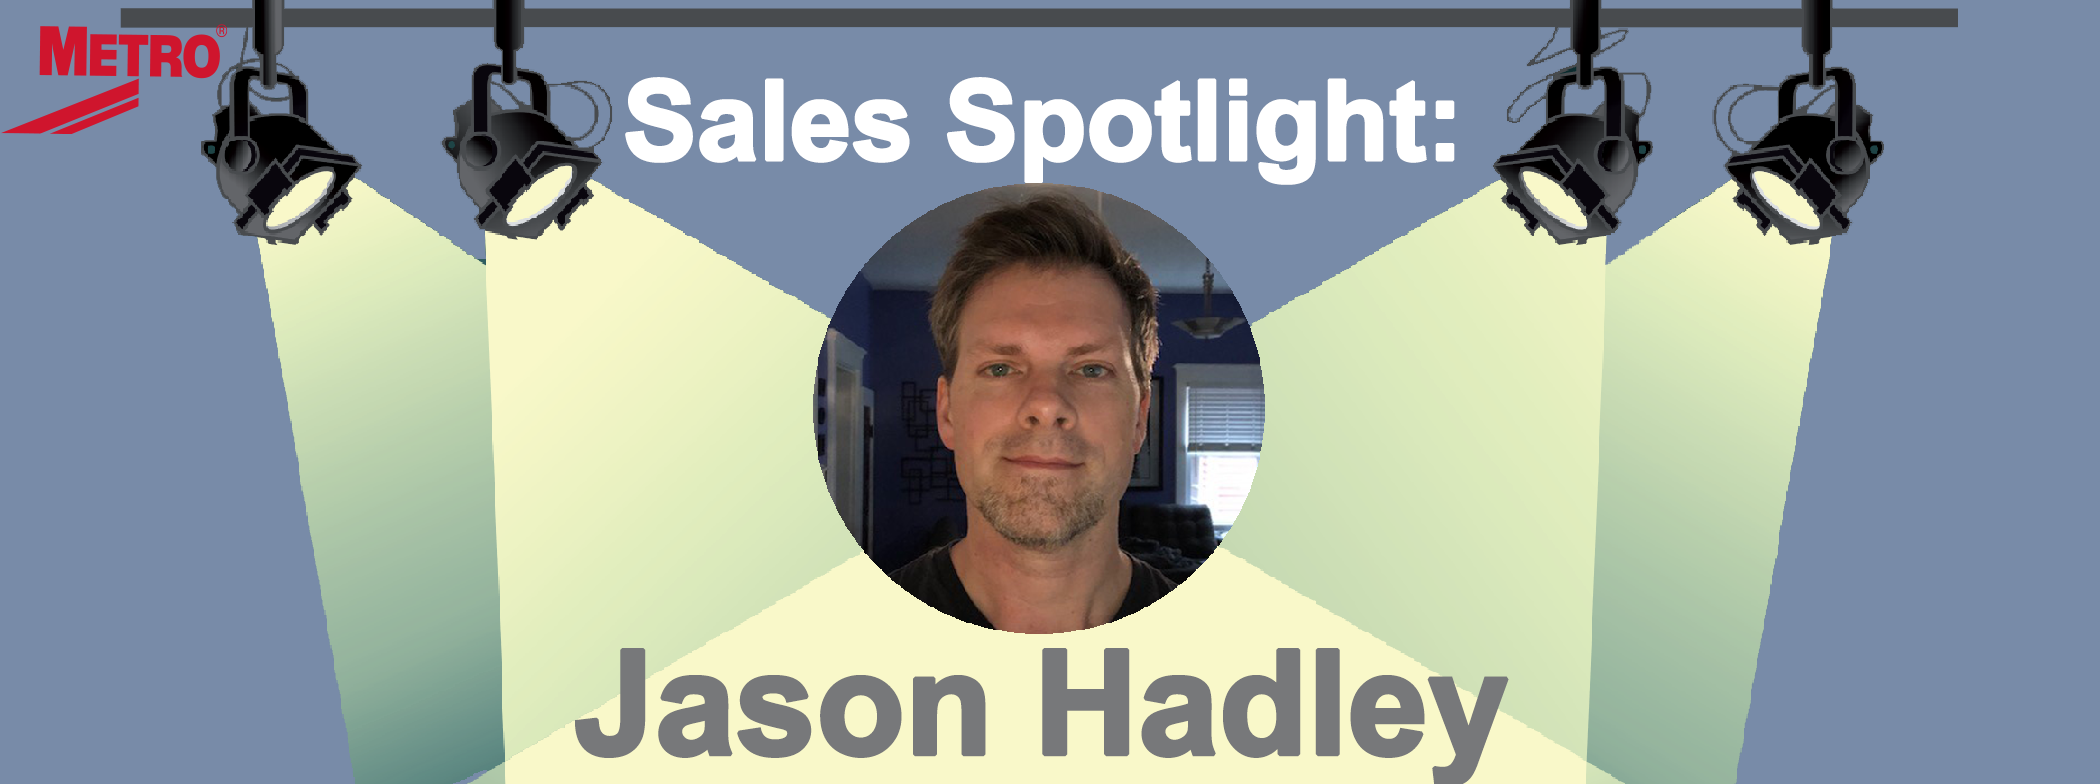 sales spotlight_jason